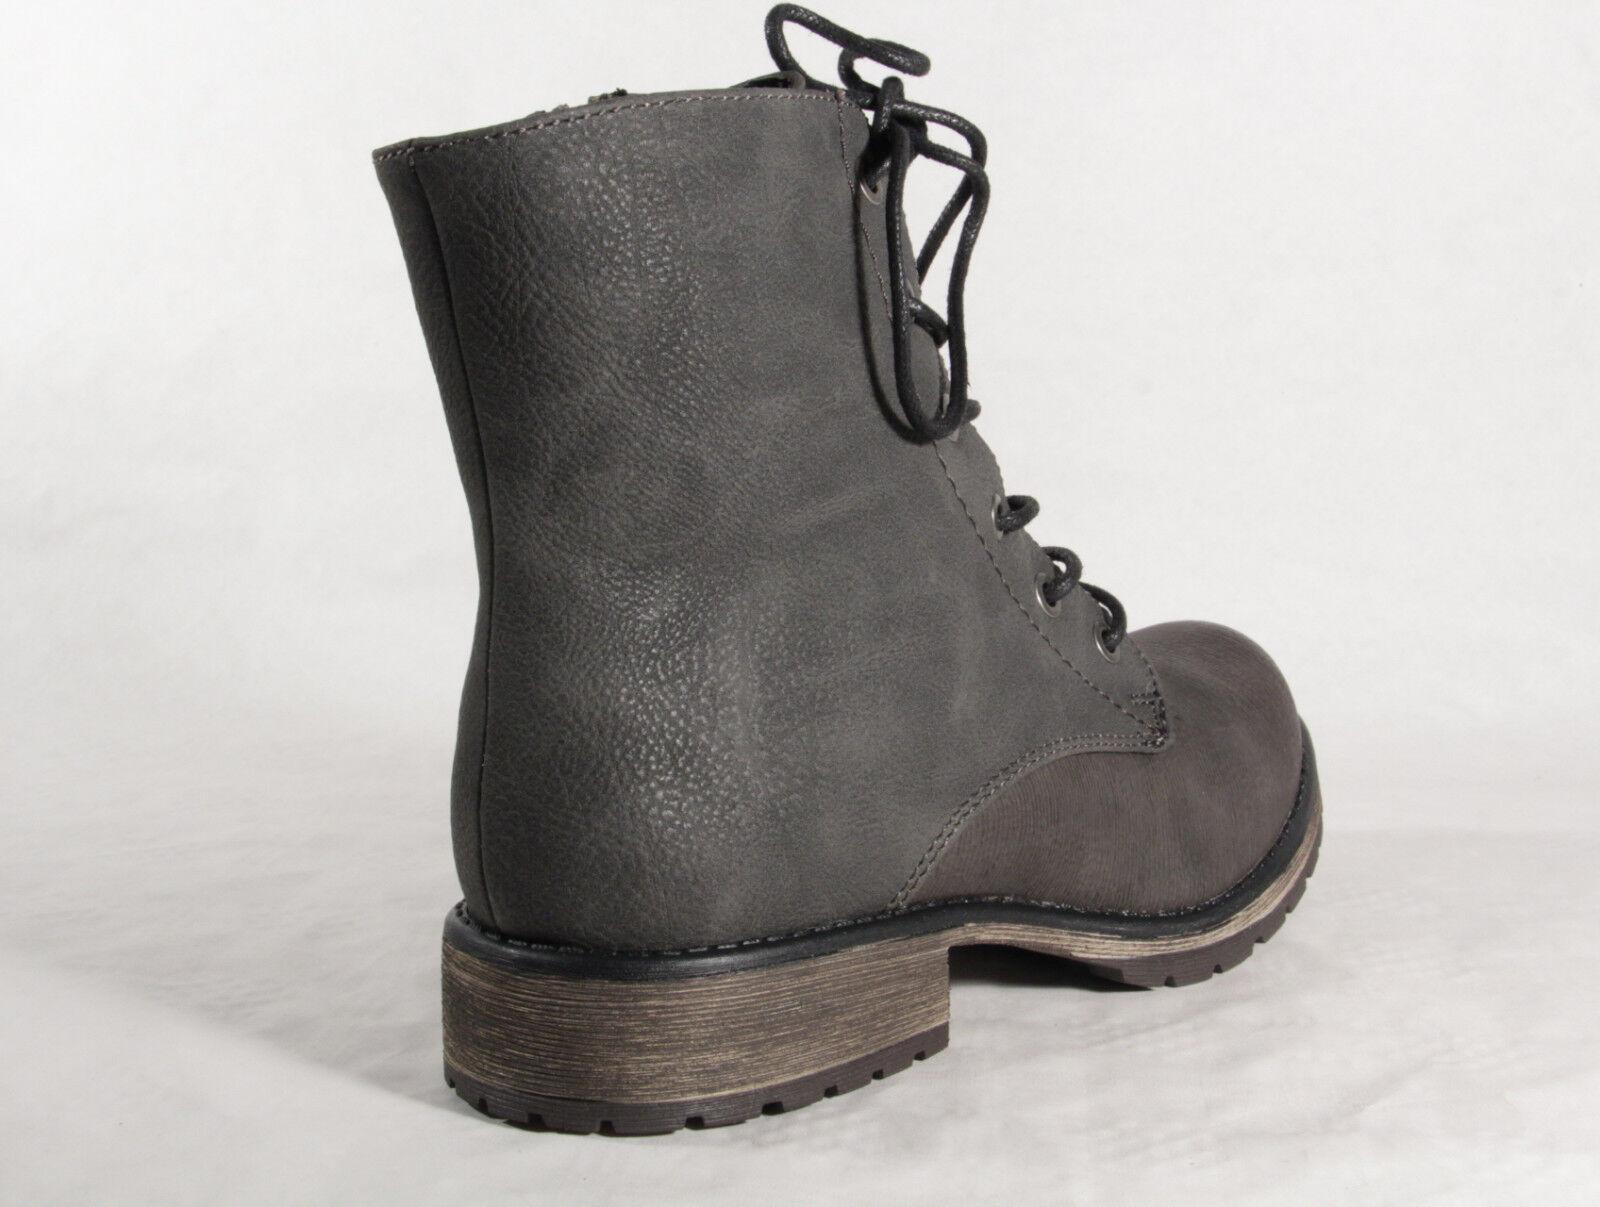 Rieker Stiefel, Stiefelette  Stiefel, NEU Winterstiefel grau 93010  NEU Stiefel, 78a687